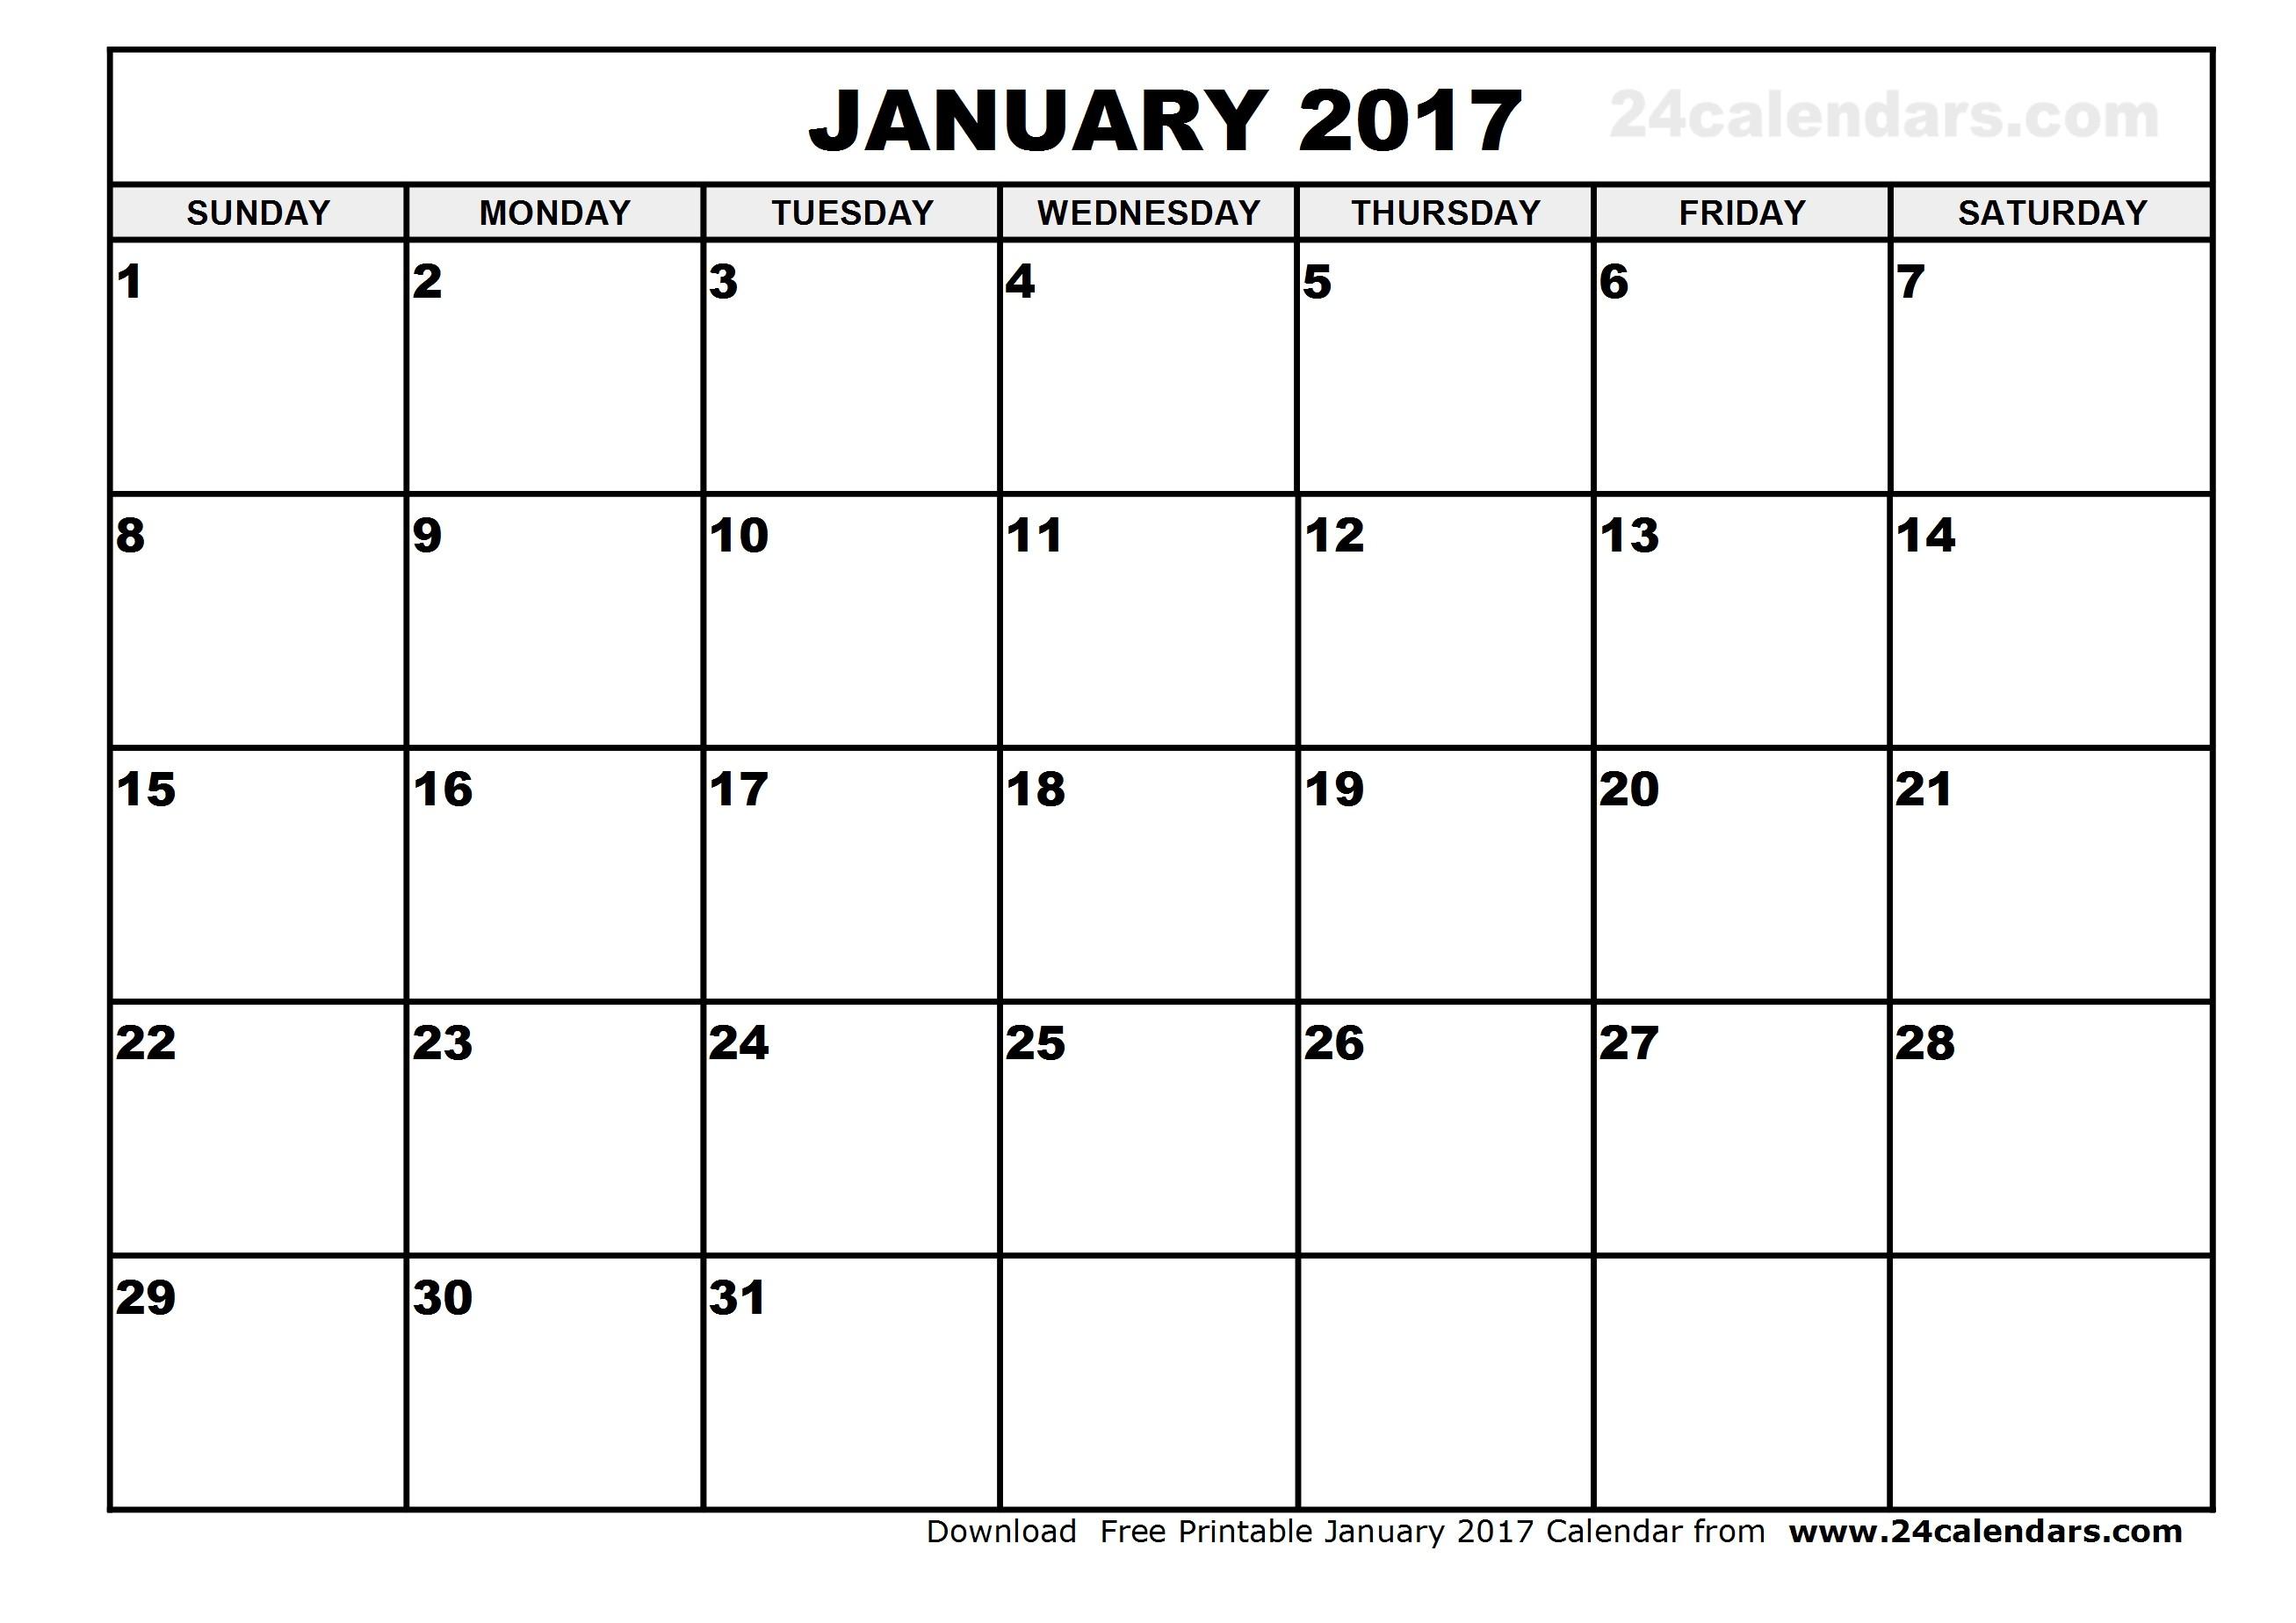 Print Calendar December 2017 January 2017 Australia